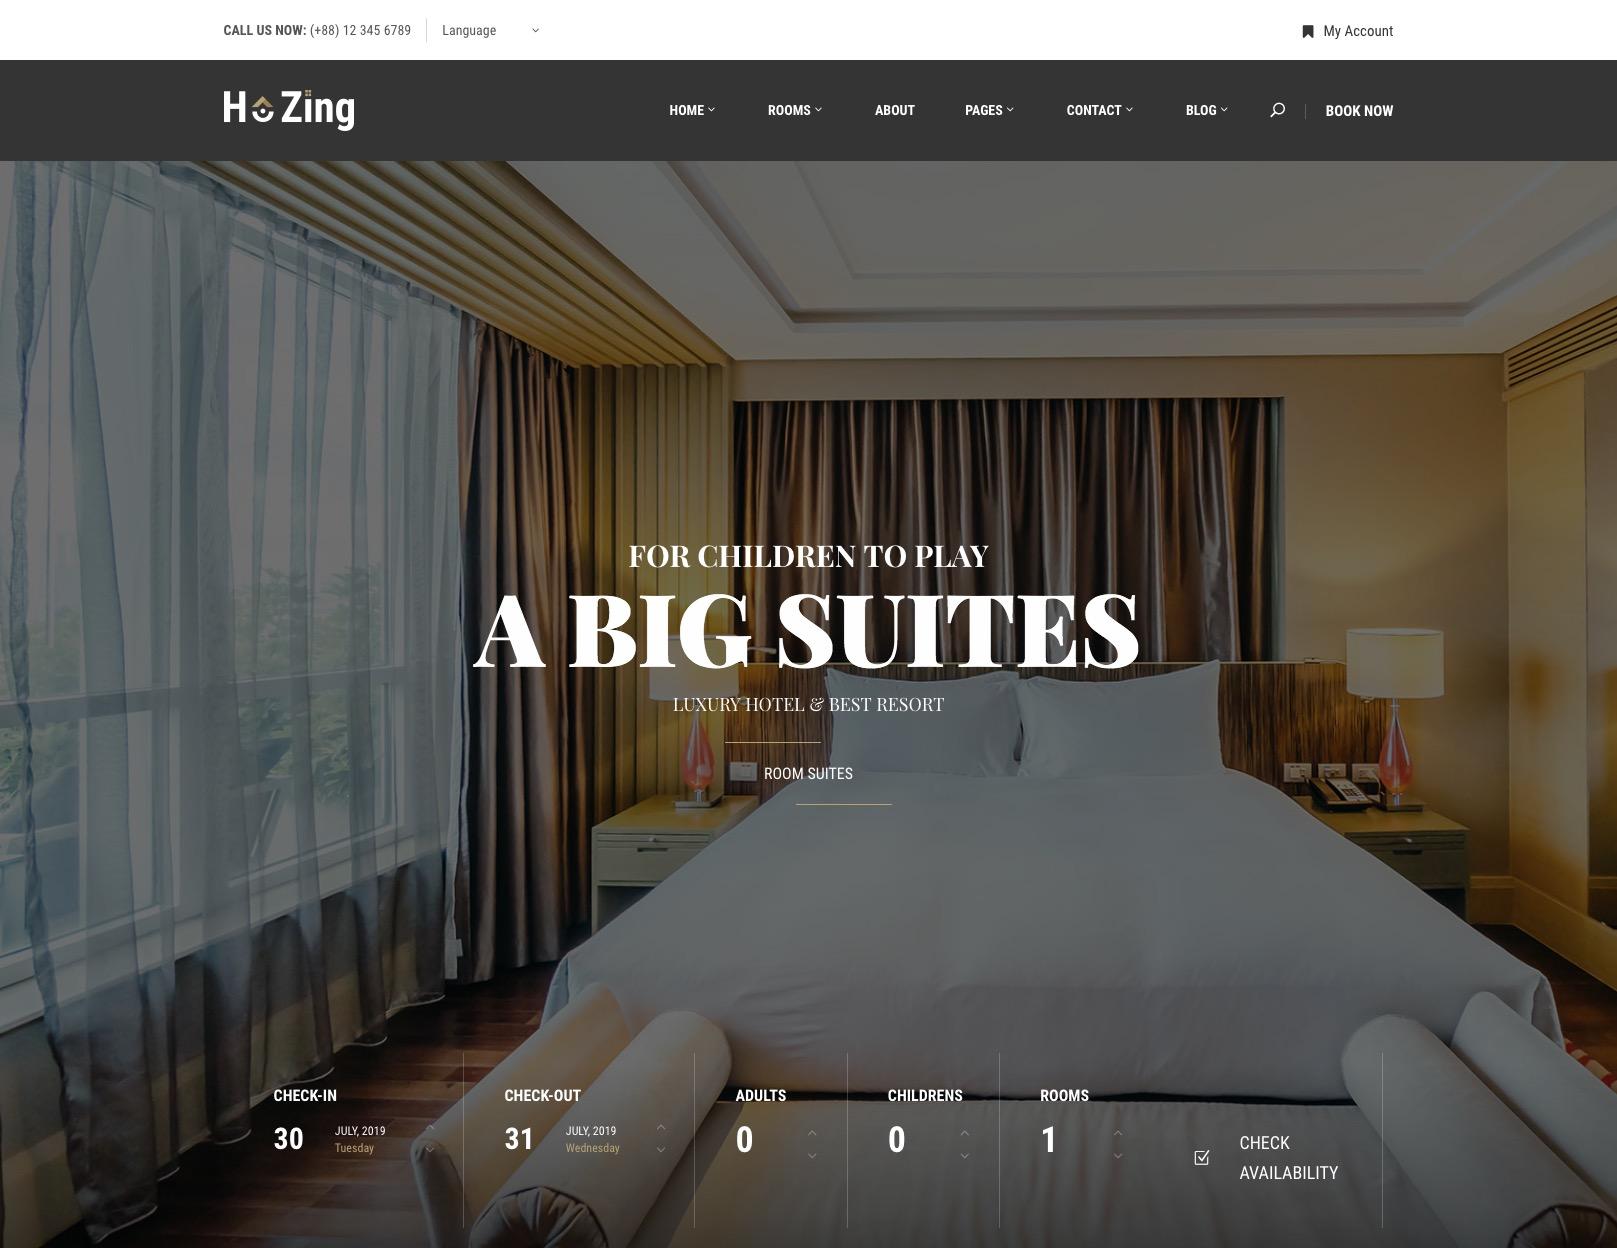 Hotel Booking WordPress Theme – Hozing Template